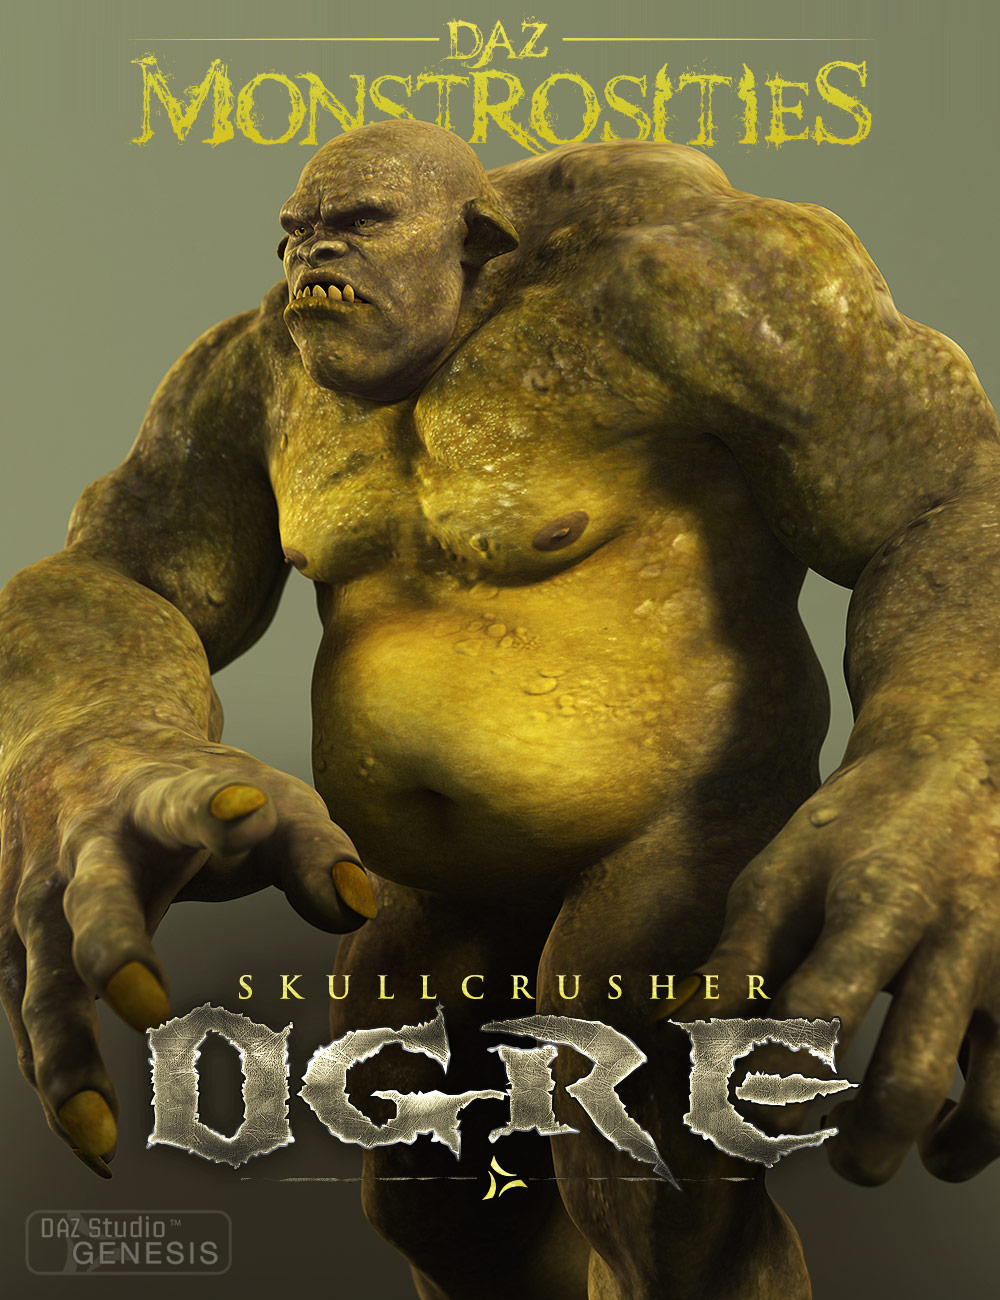 DAZ Monstrosities: Skullcrusher Ogre by: , 3D Models by Daz 3D